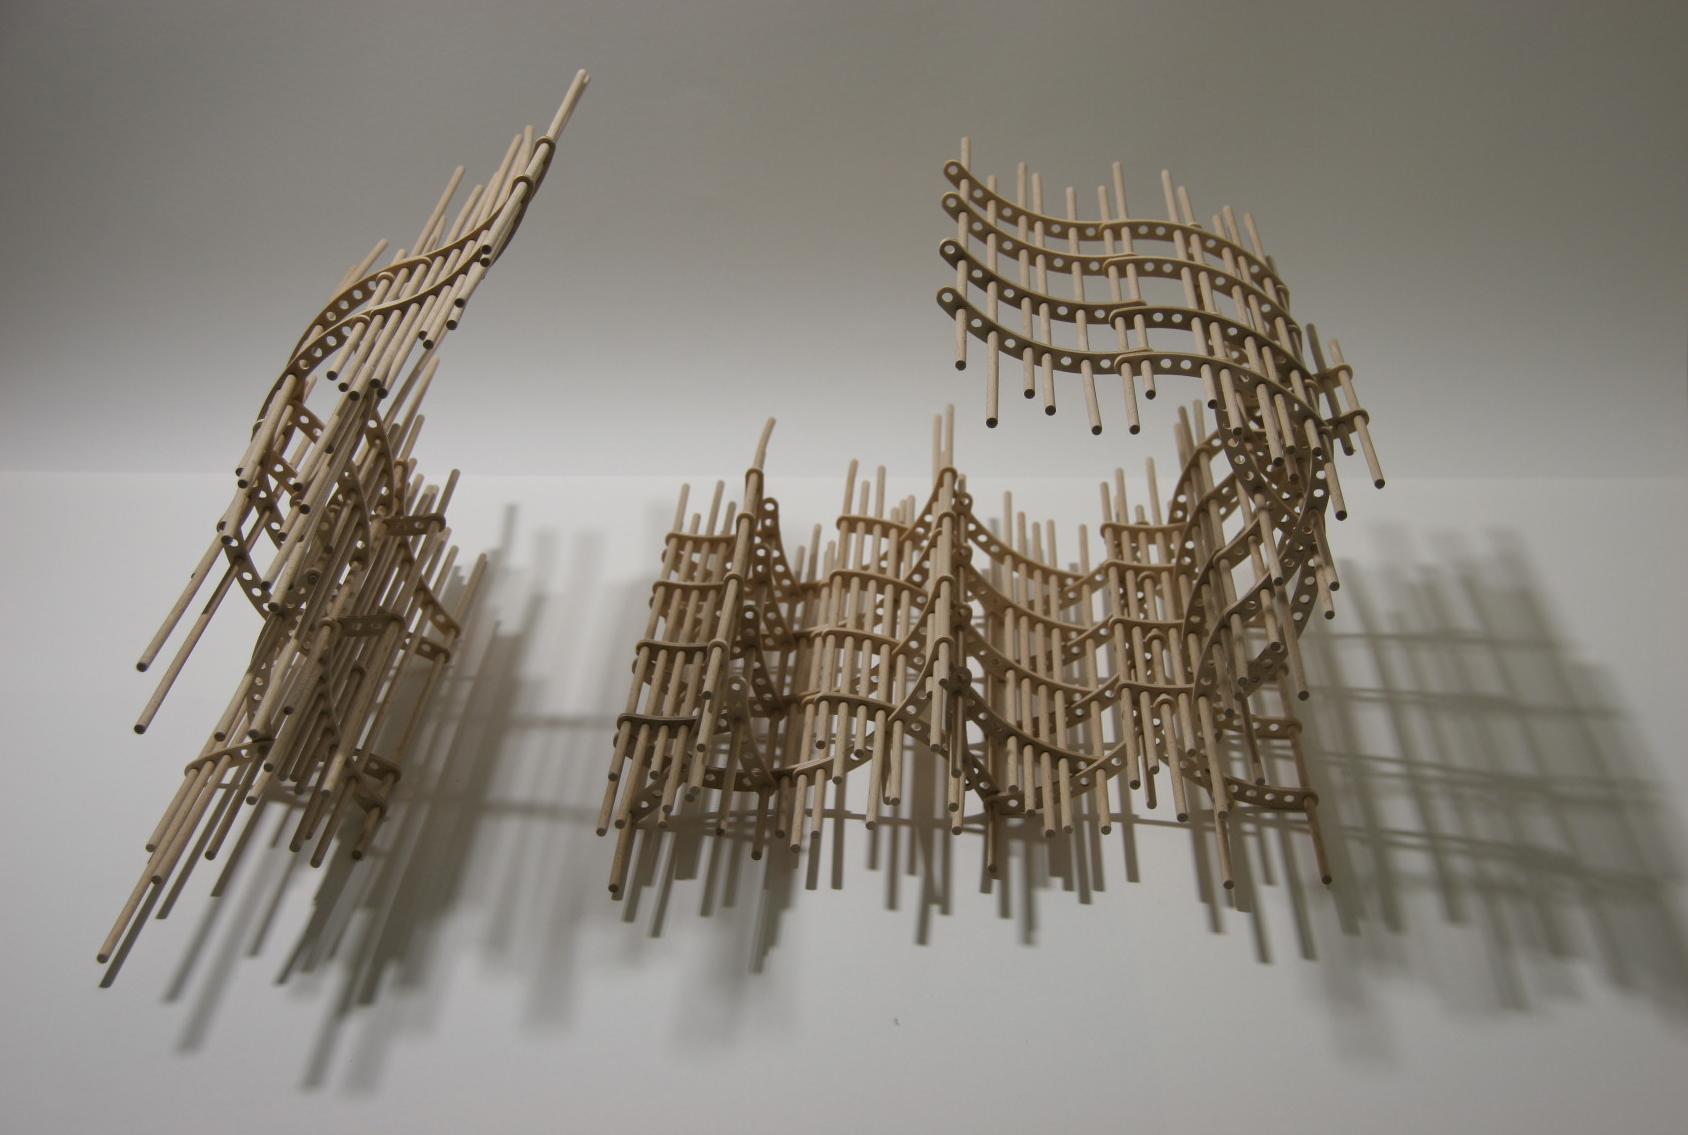 Solaris, 2009; plywood, wooden sticks, 56 x 58 x 30 cm